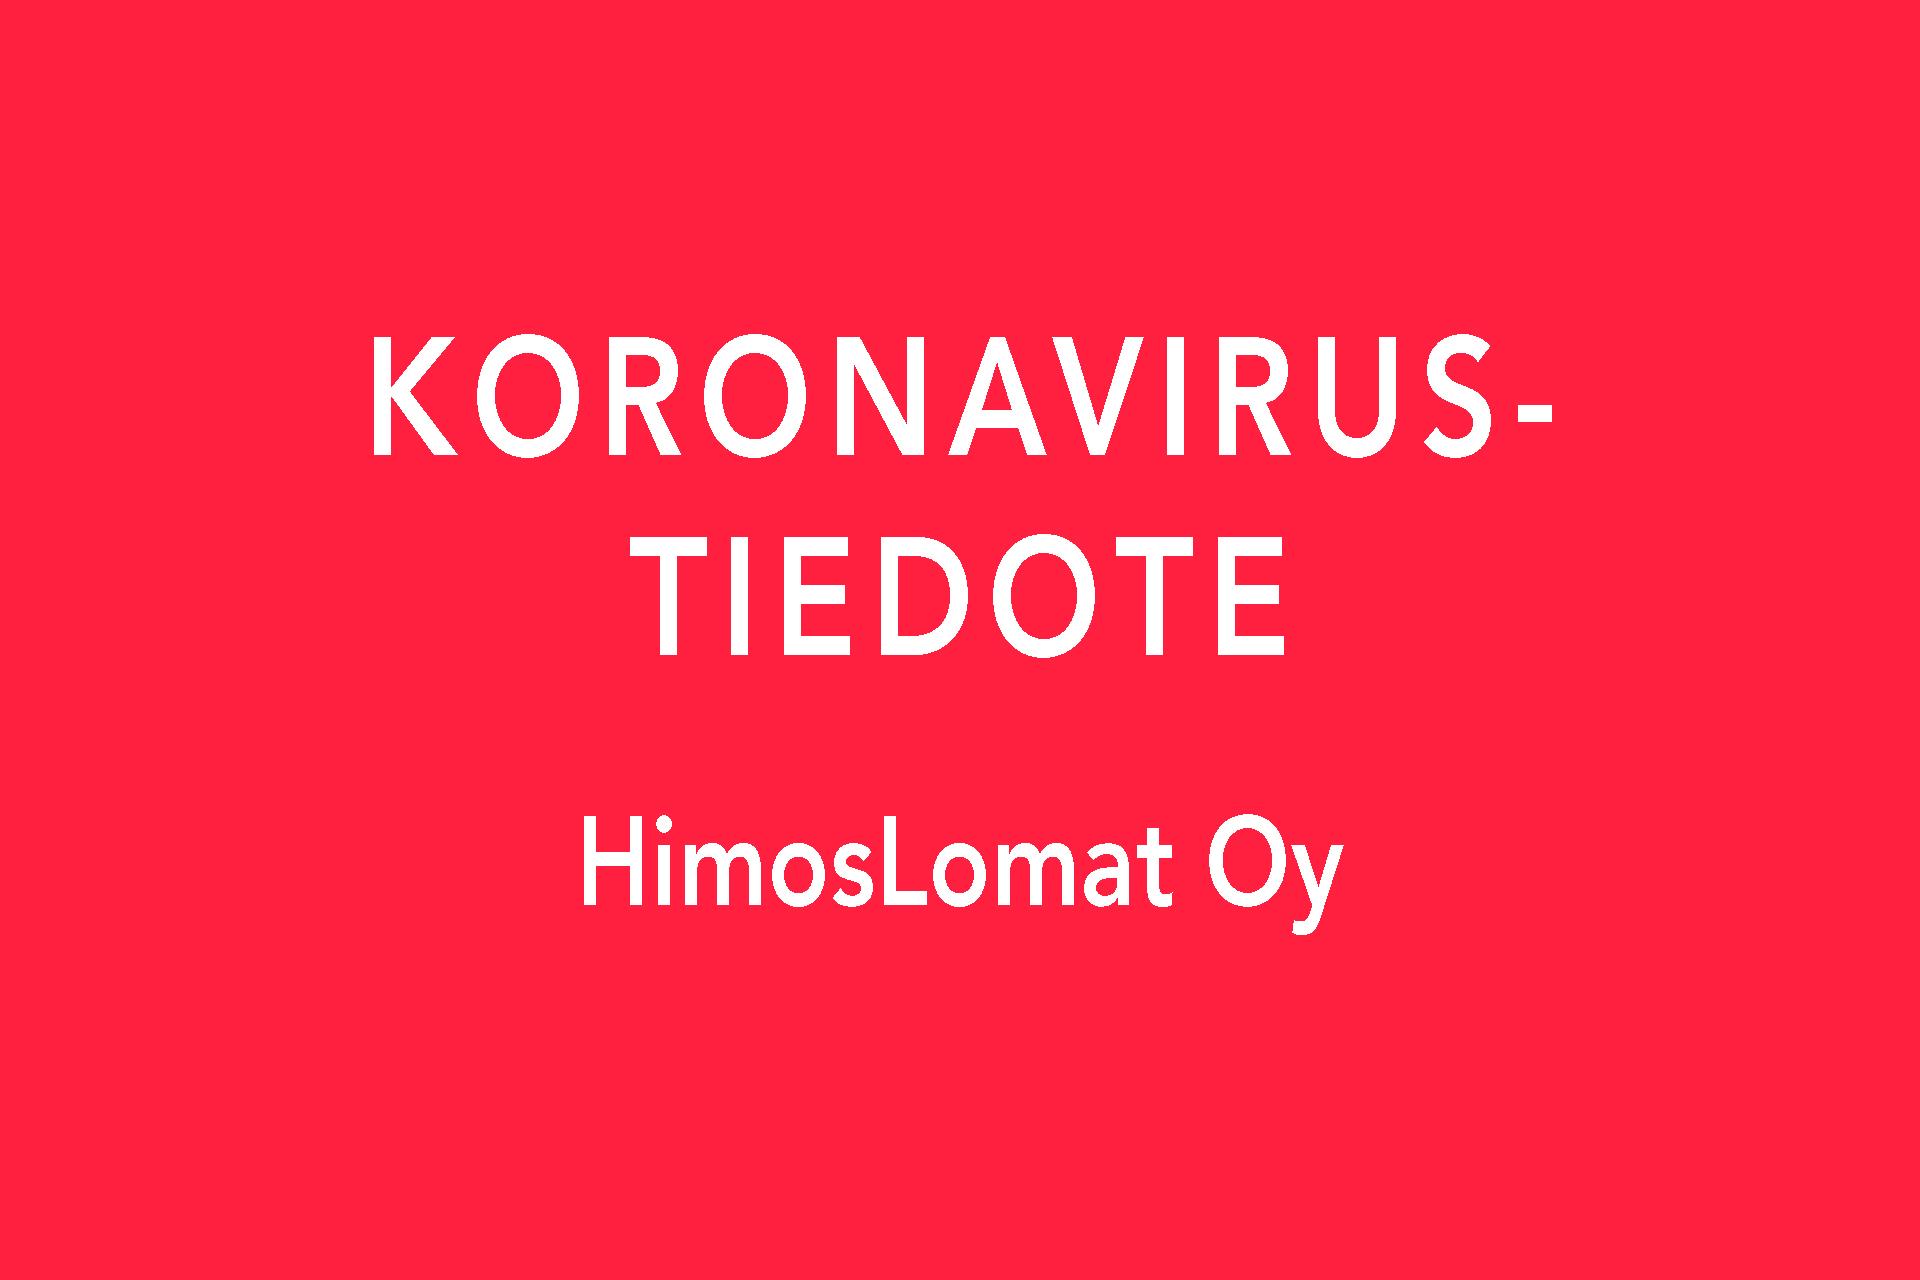 Koronavirus HimosLomat